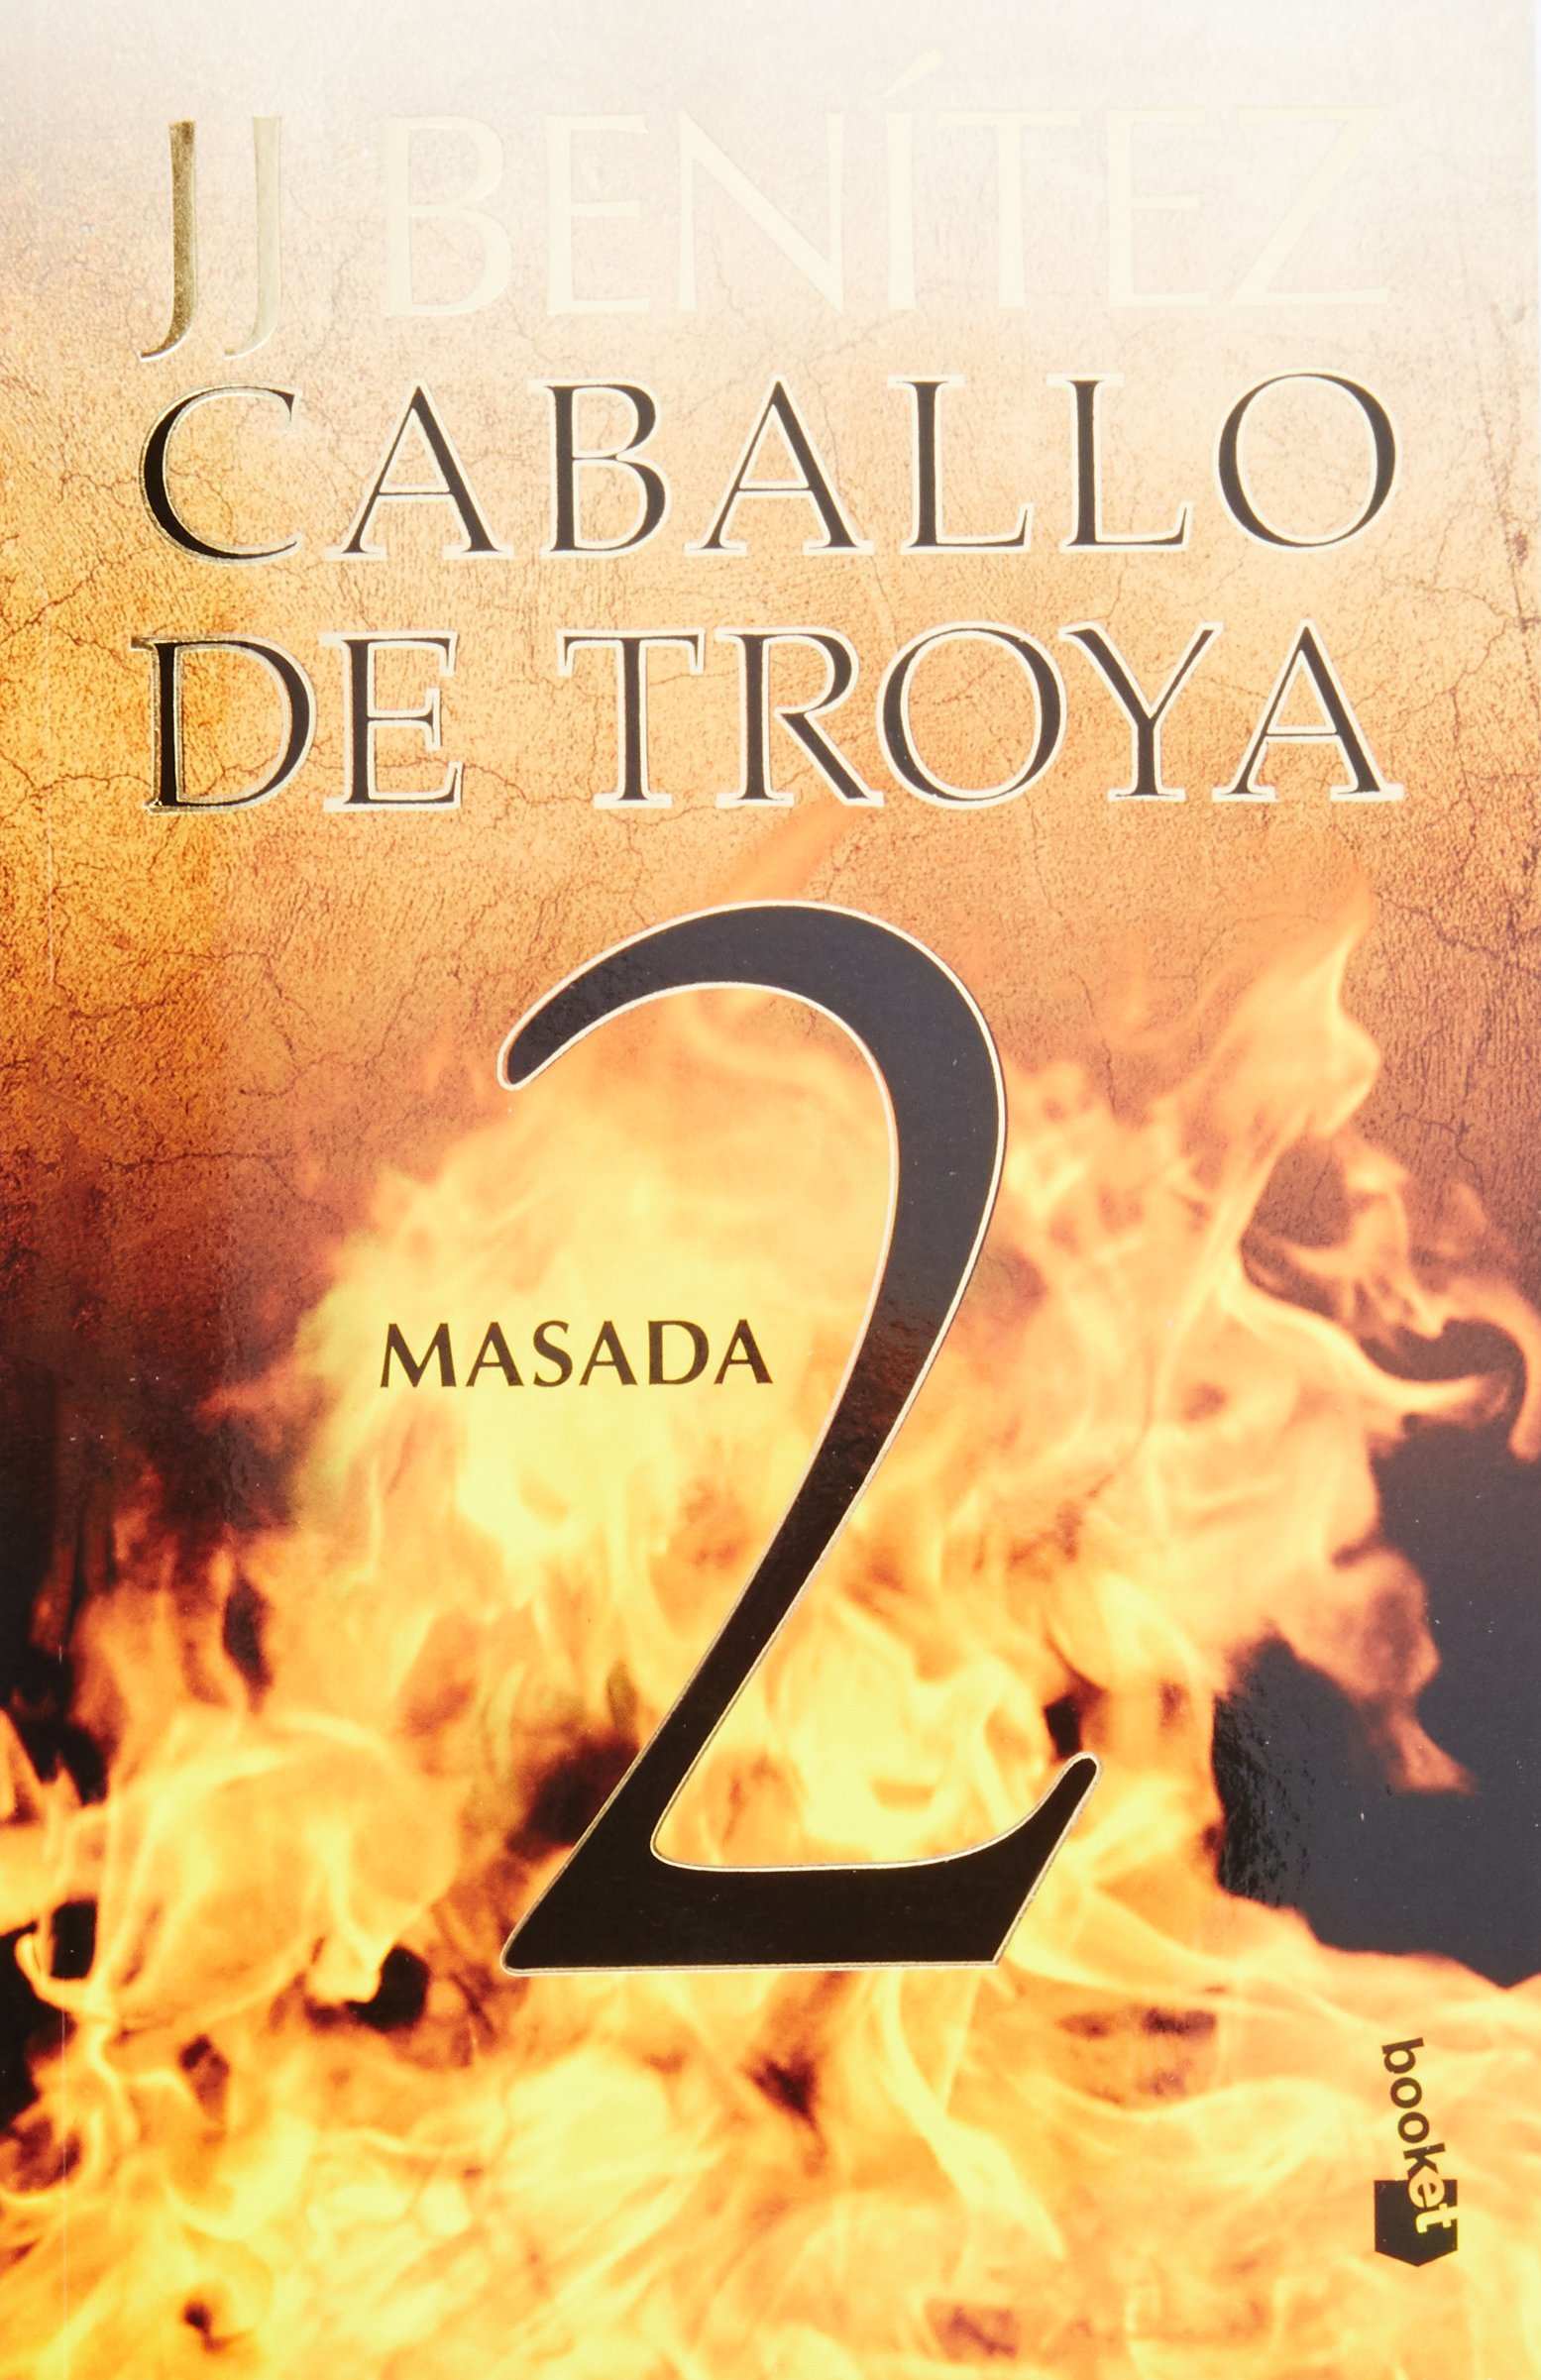 Caballo de Troya 2 (Nueva edic.): 1:J. J. Benítez: Amazon.com.mx: Libros